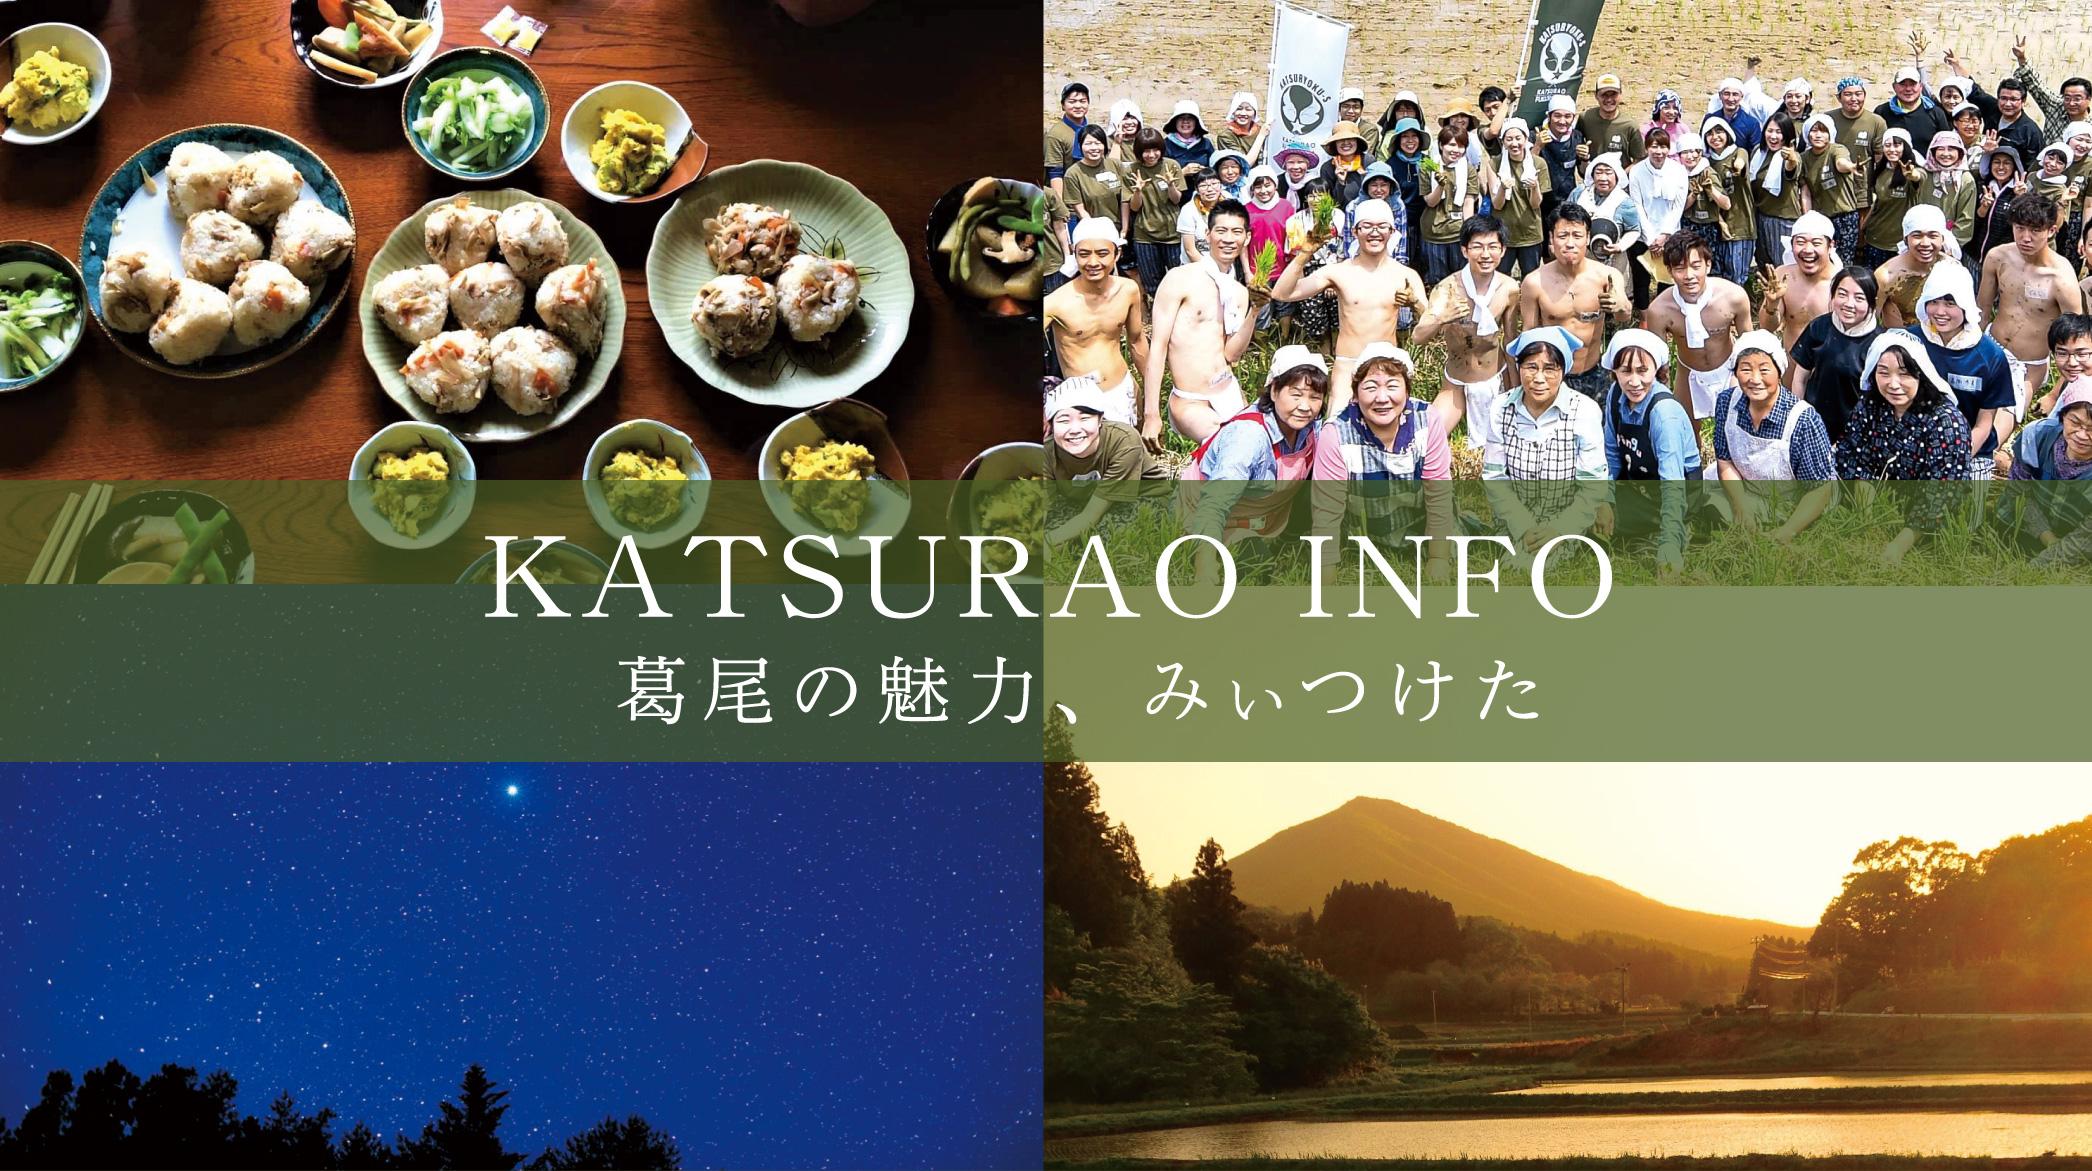 KATSURAO INFO - 葛尾の魅力、みいつけた